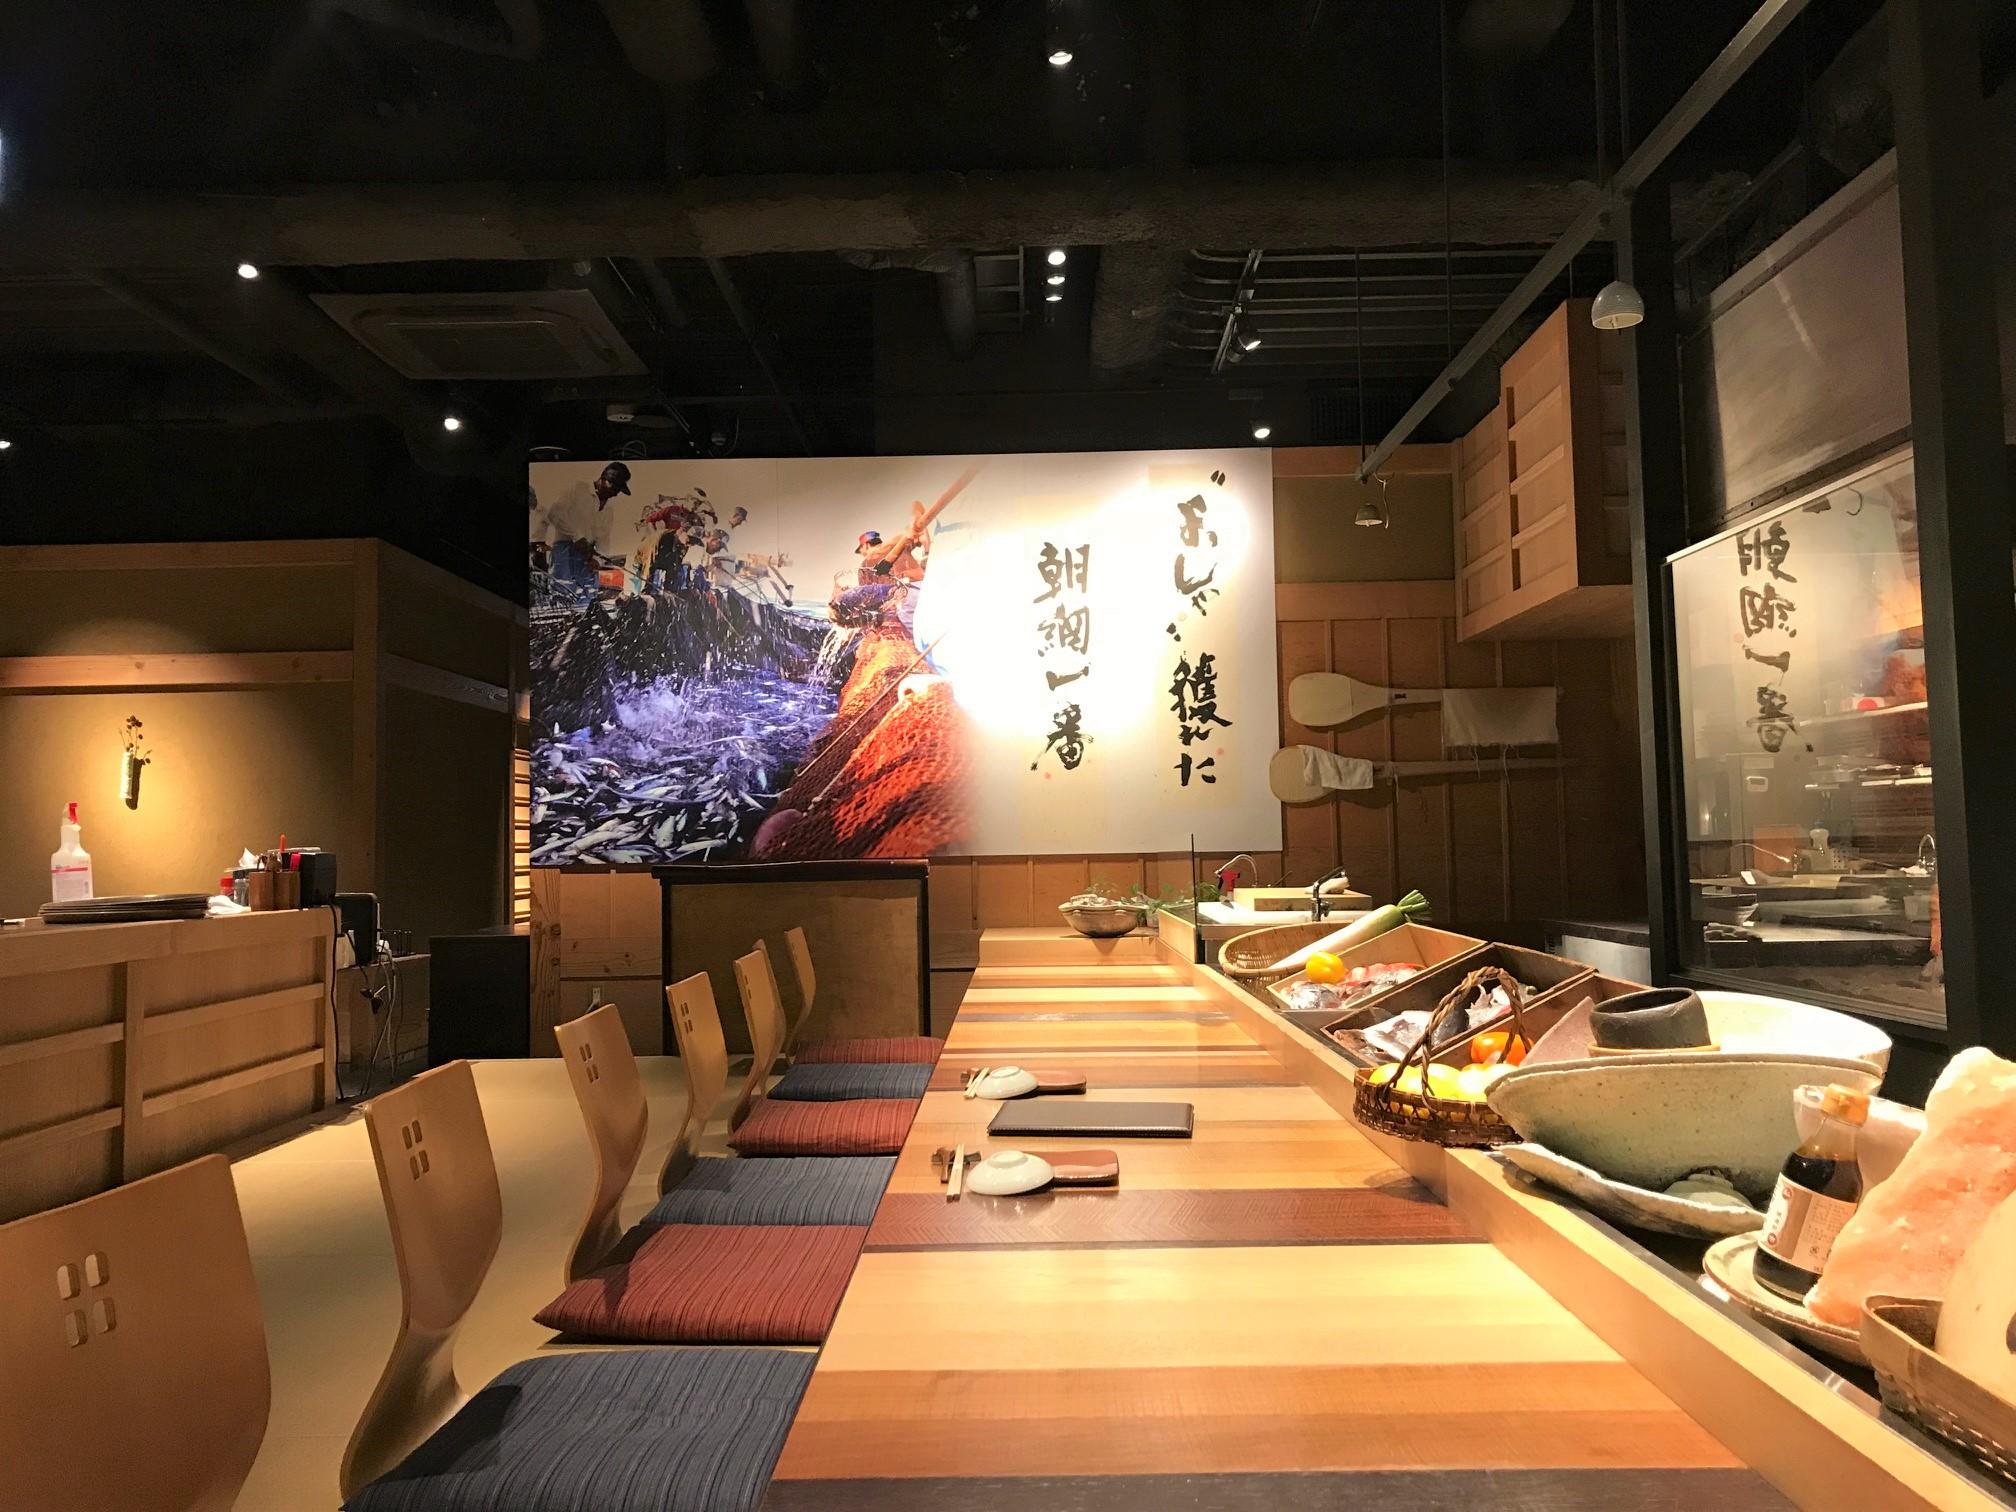 Robata experience in Shinsaibashi, Osaka: Chance Ginpei